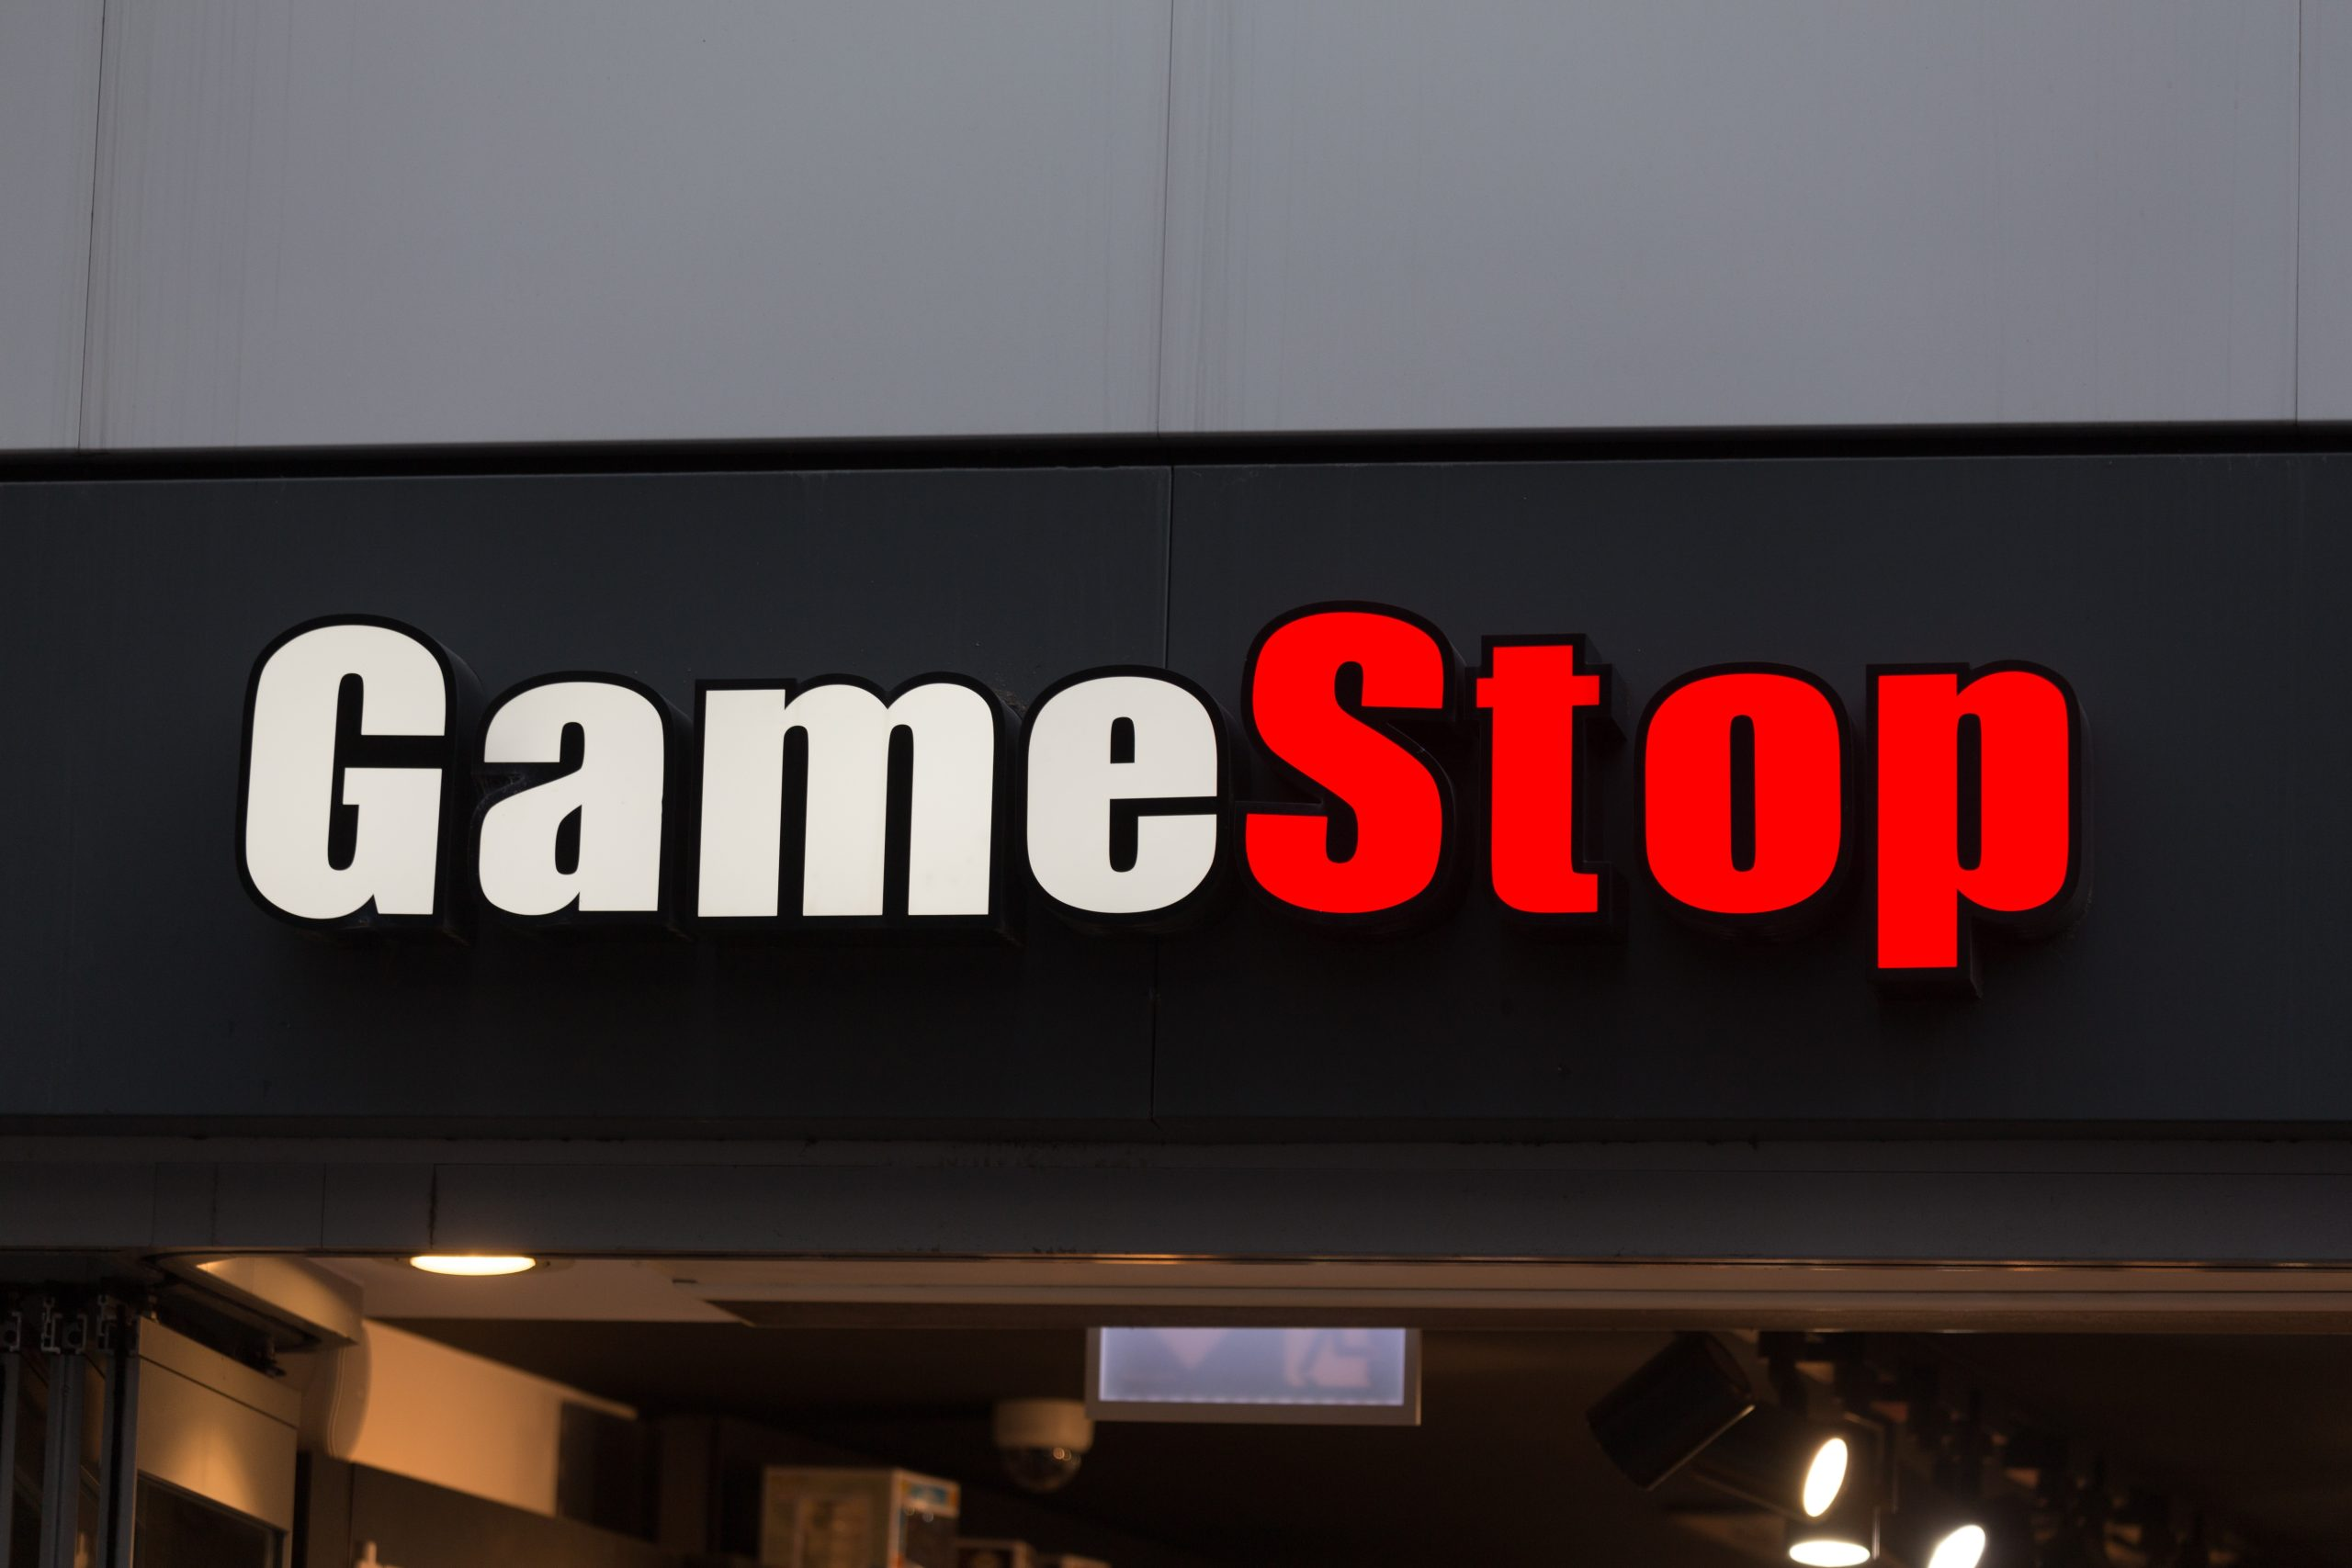 GameStop storefront sign